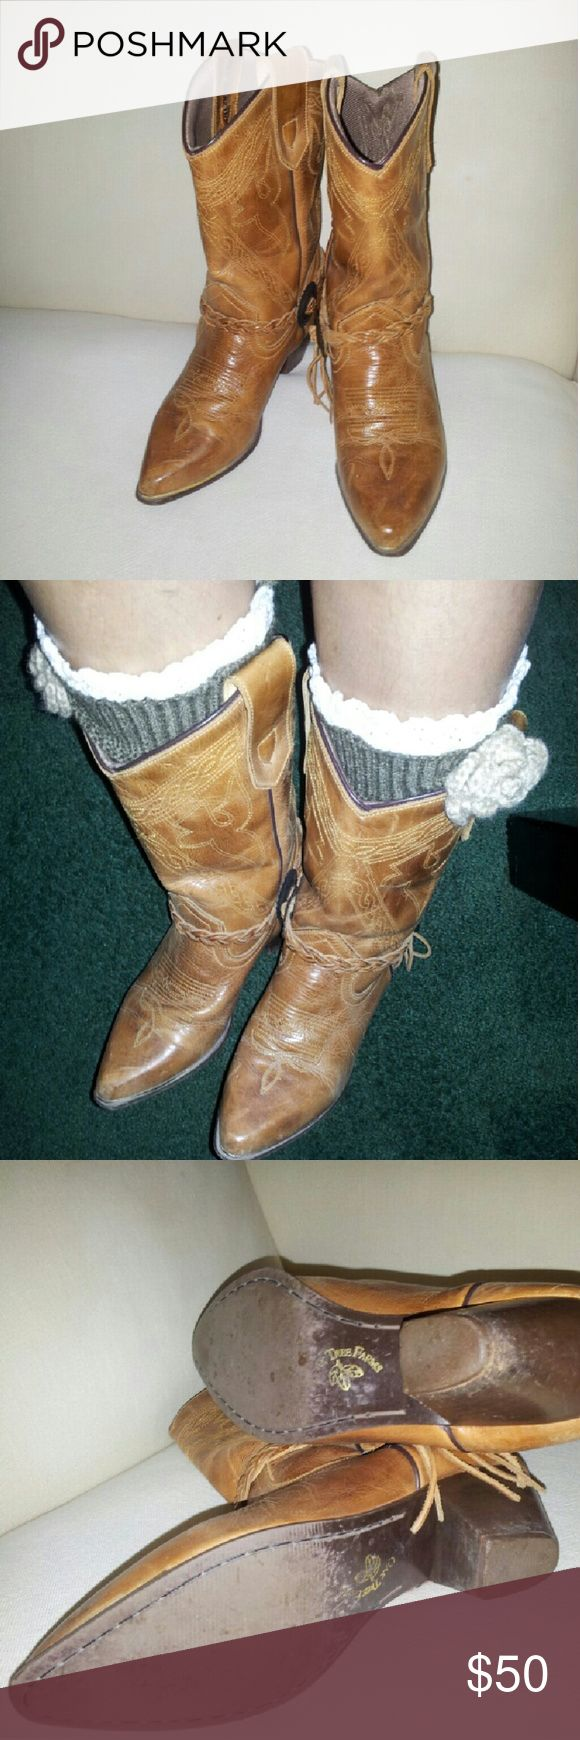 cowboy oak tree farm boots vintage  Oak Tree Farms  Tan leather cowboy boots, in good condition. oak tree farm  Shoes Heeled Boots